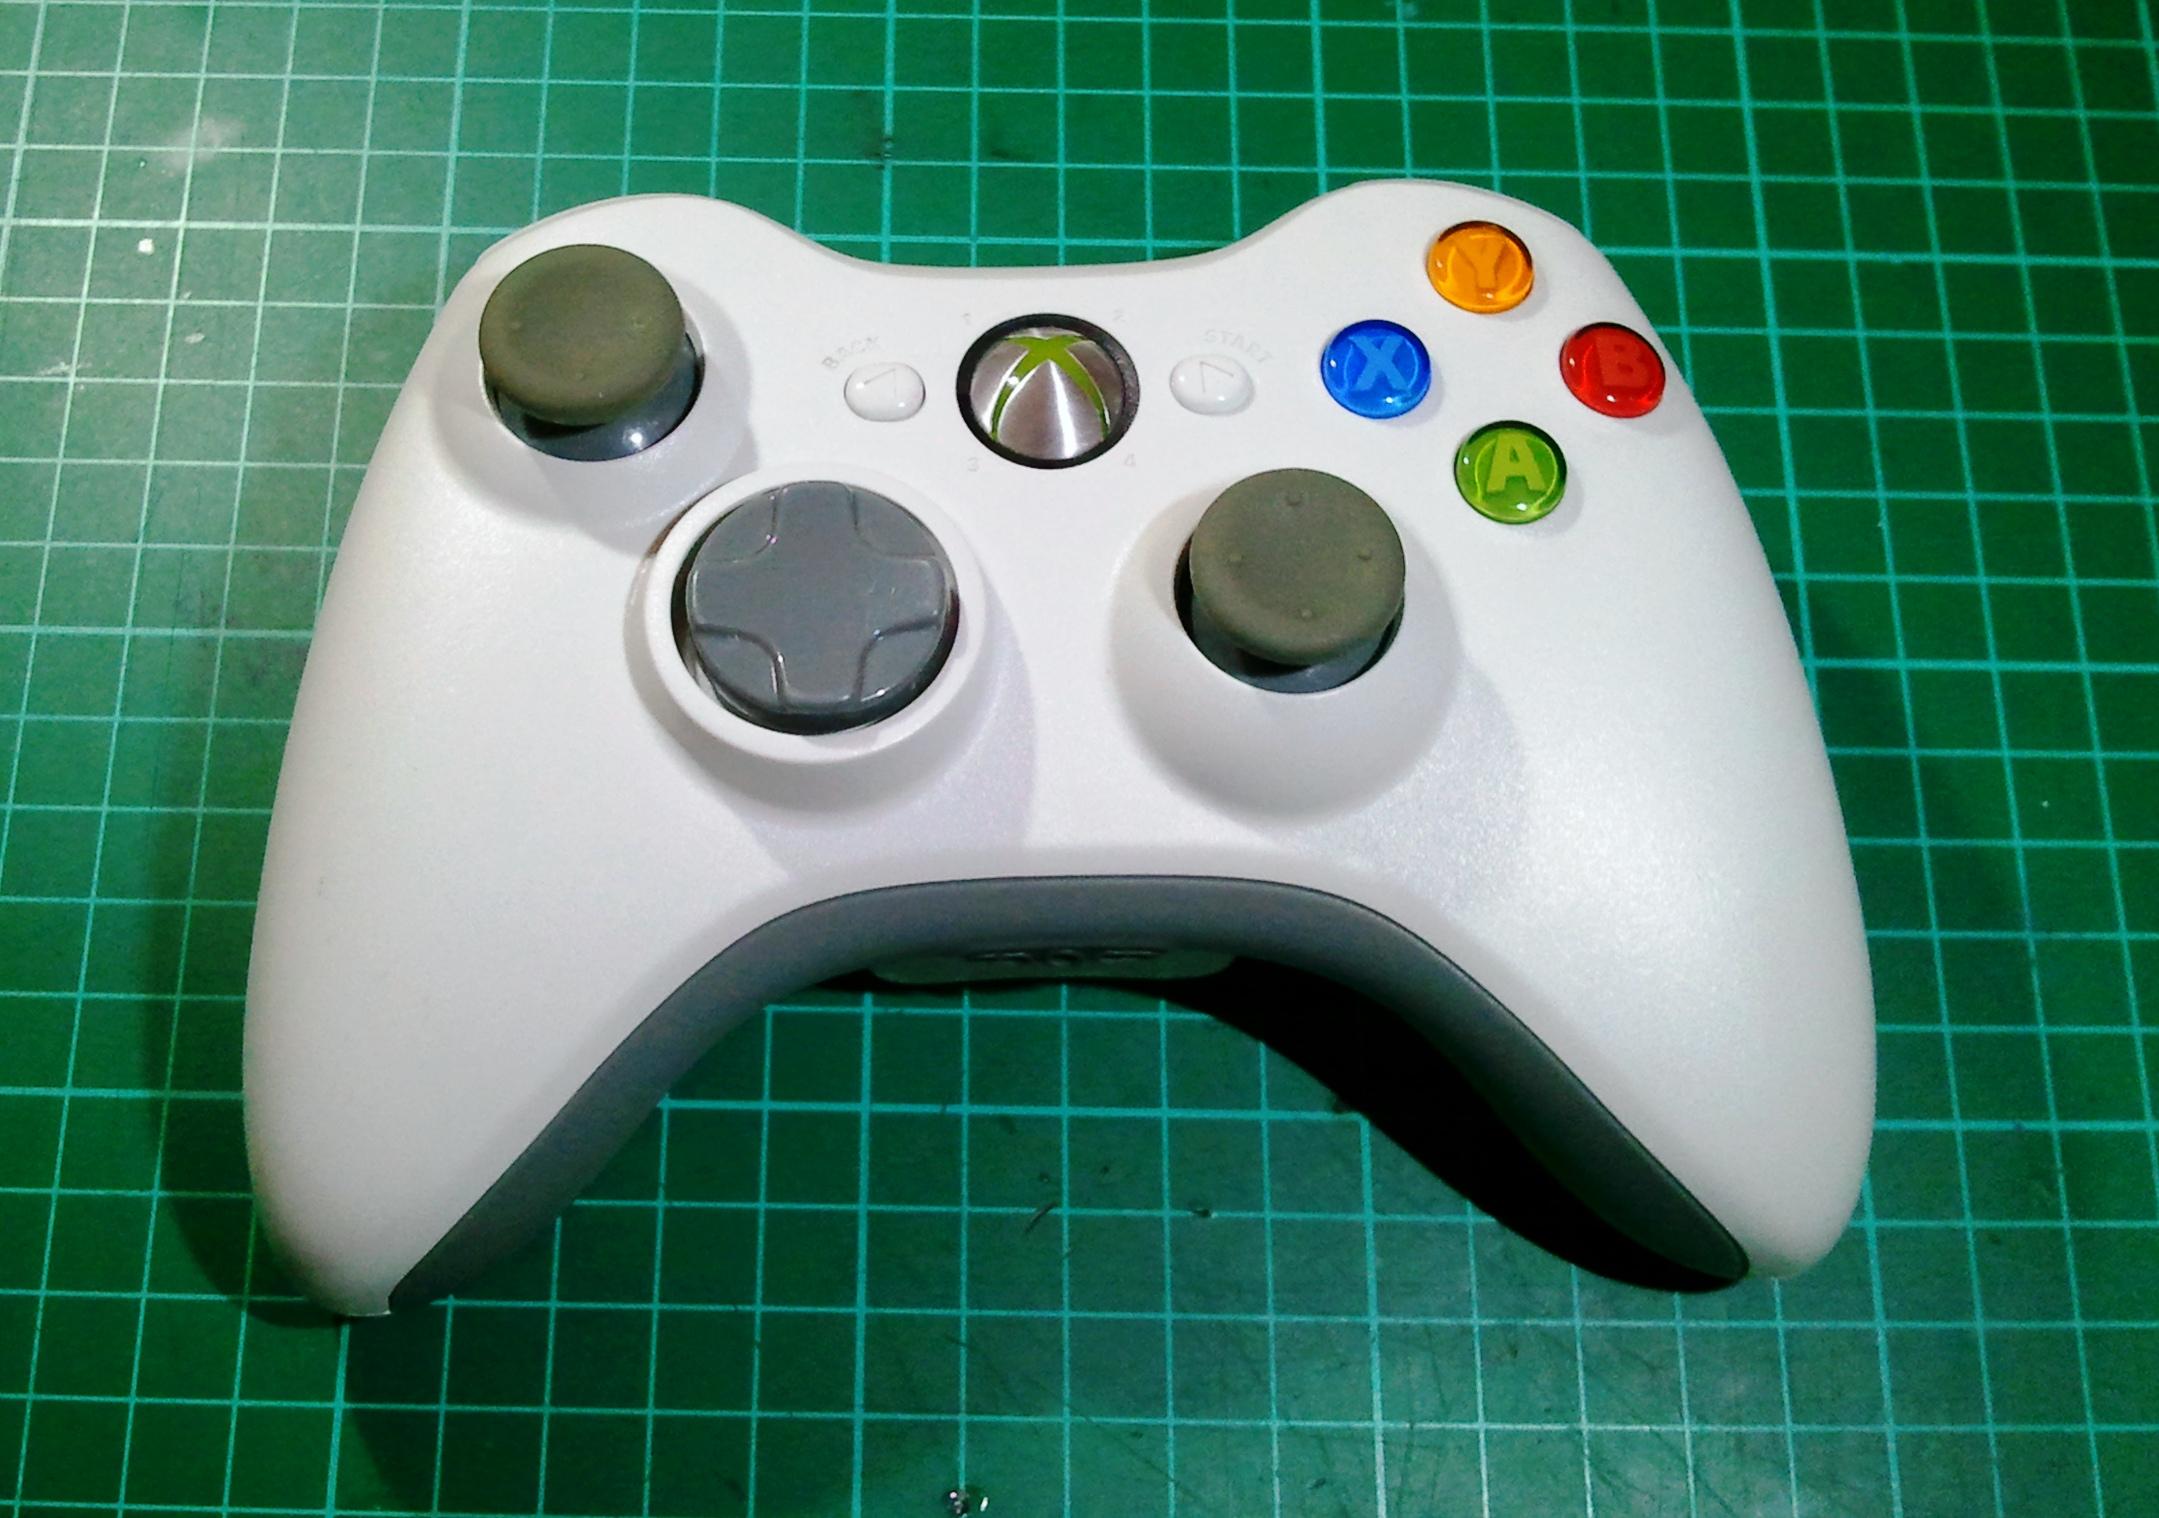 Picture of Xbox 360 Rapid Fire Modification